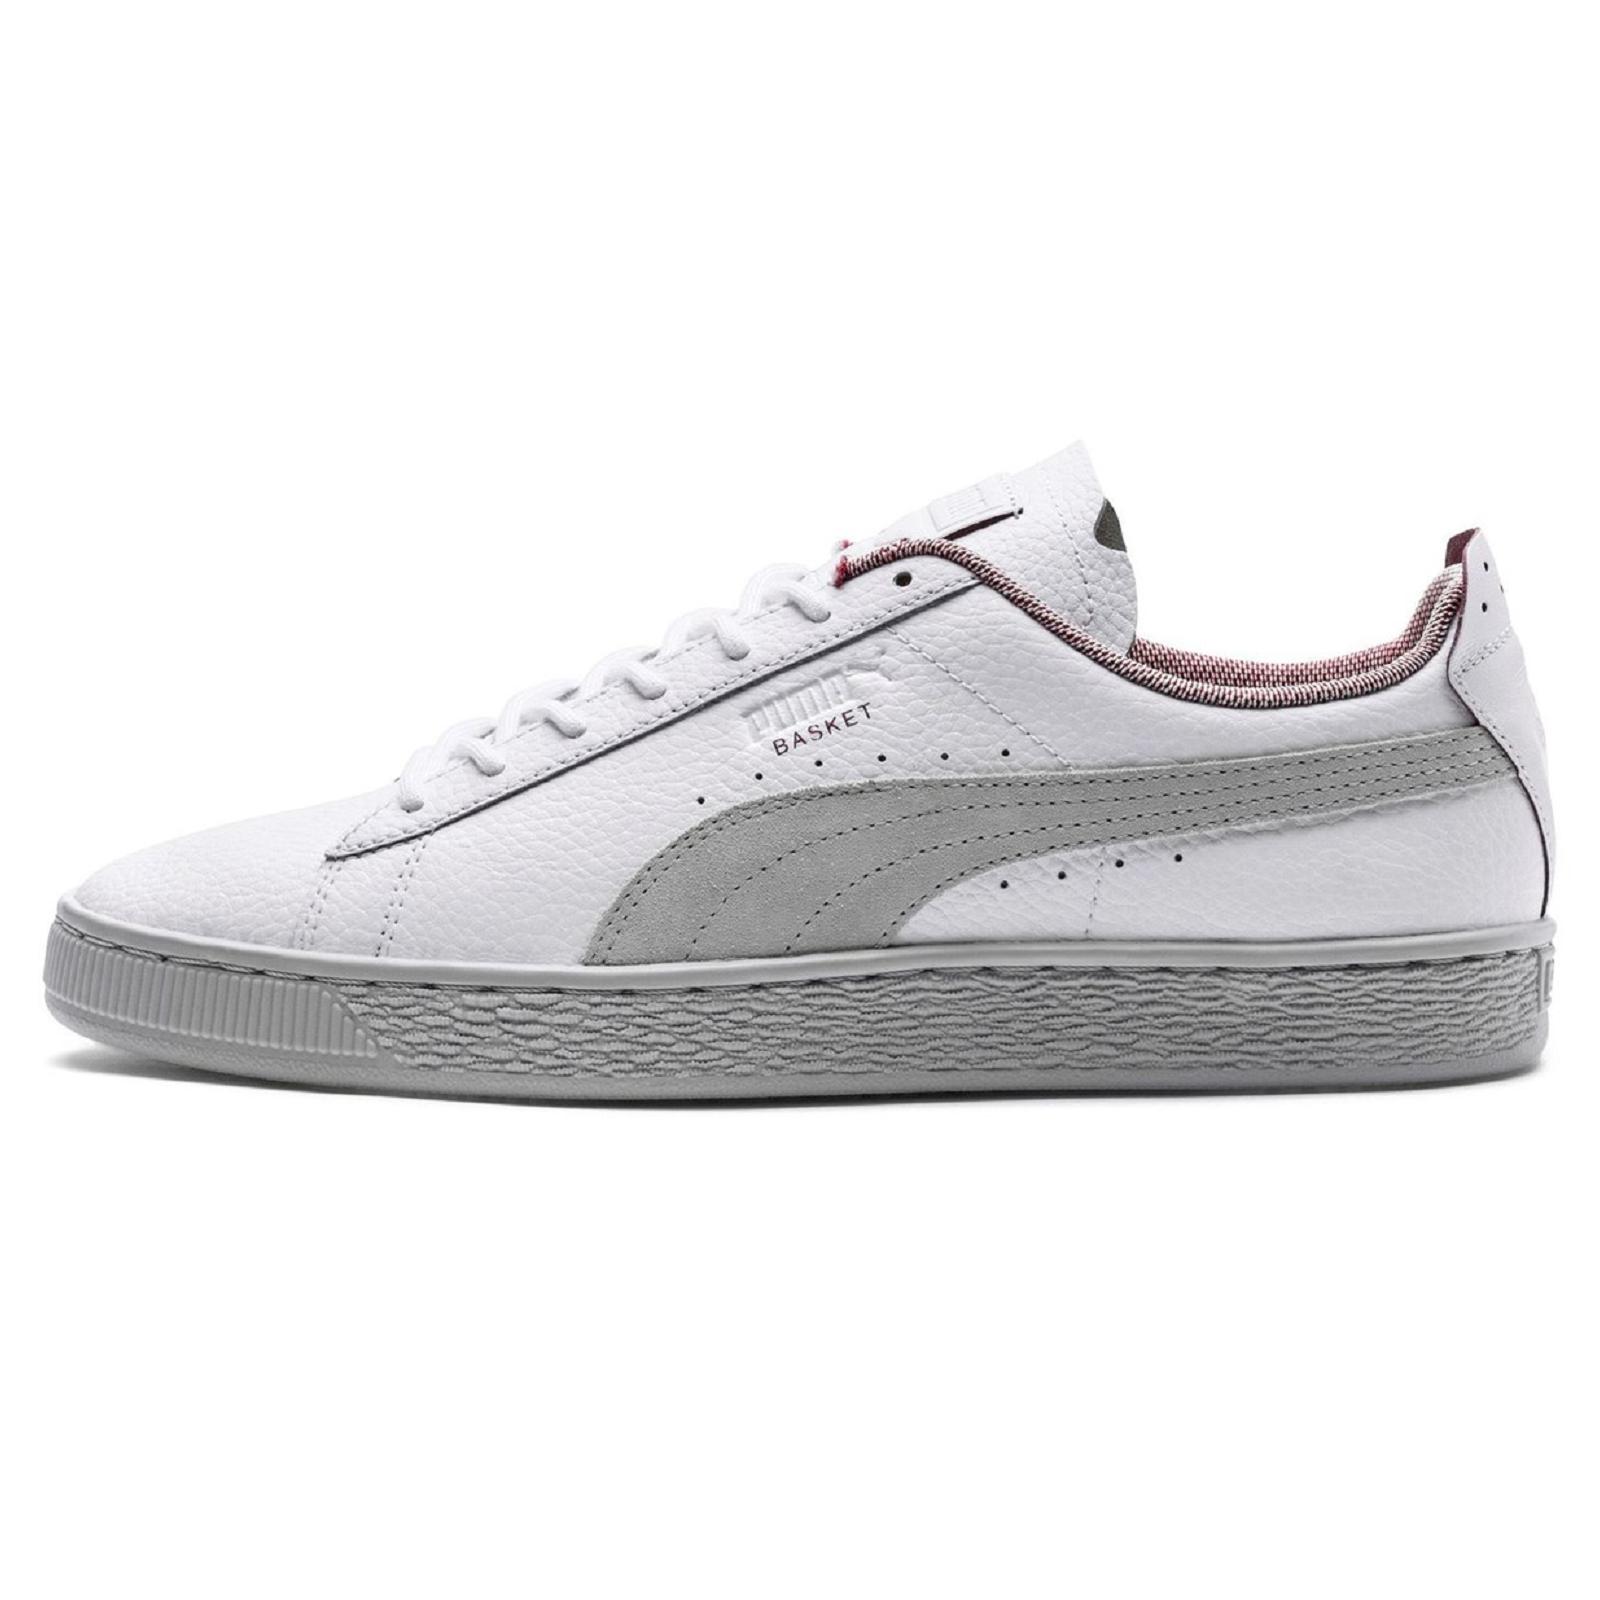 SF Scuderia Ferrari Basket LS Lifestyle Sneaker Turnschuhe weiß 306214 02